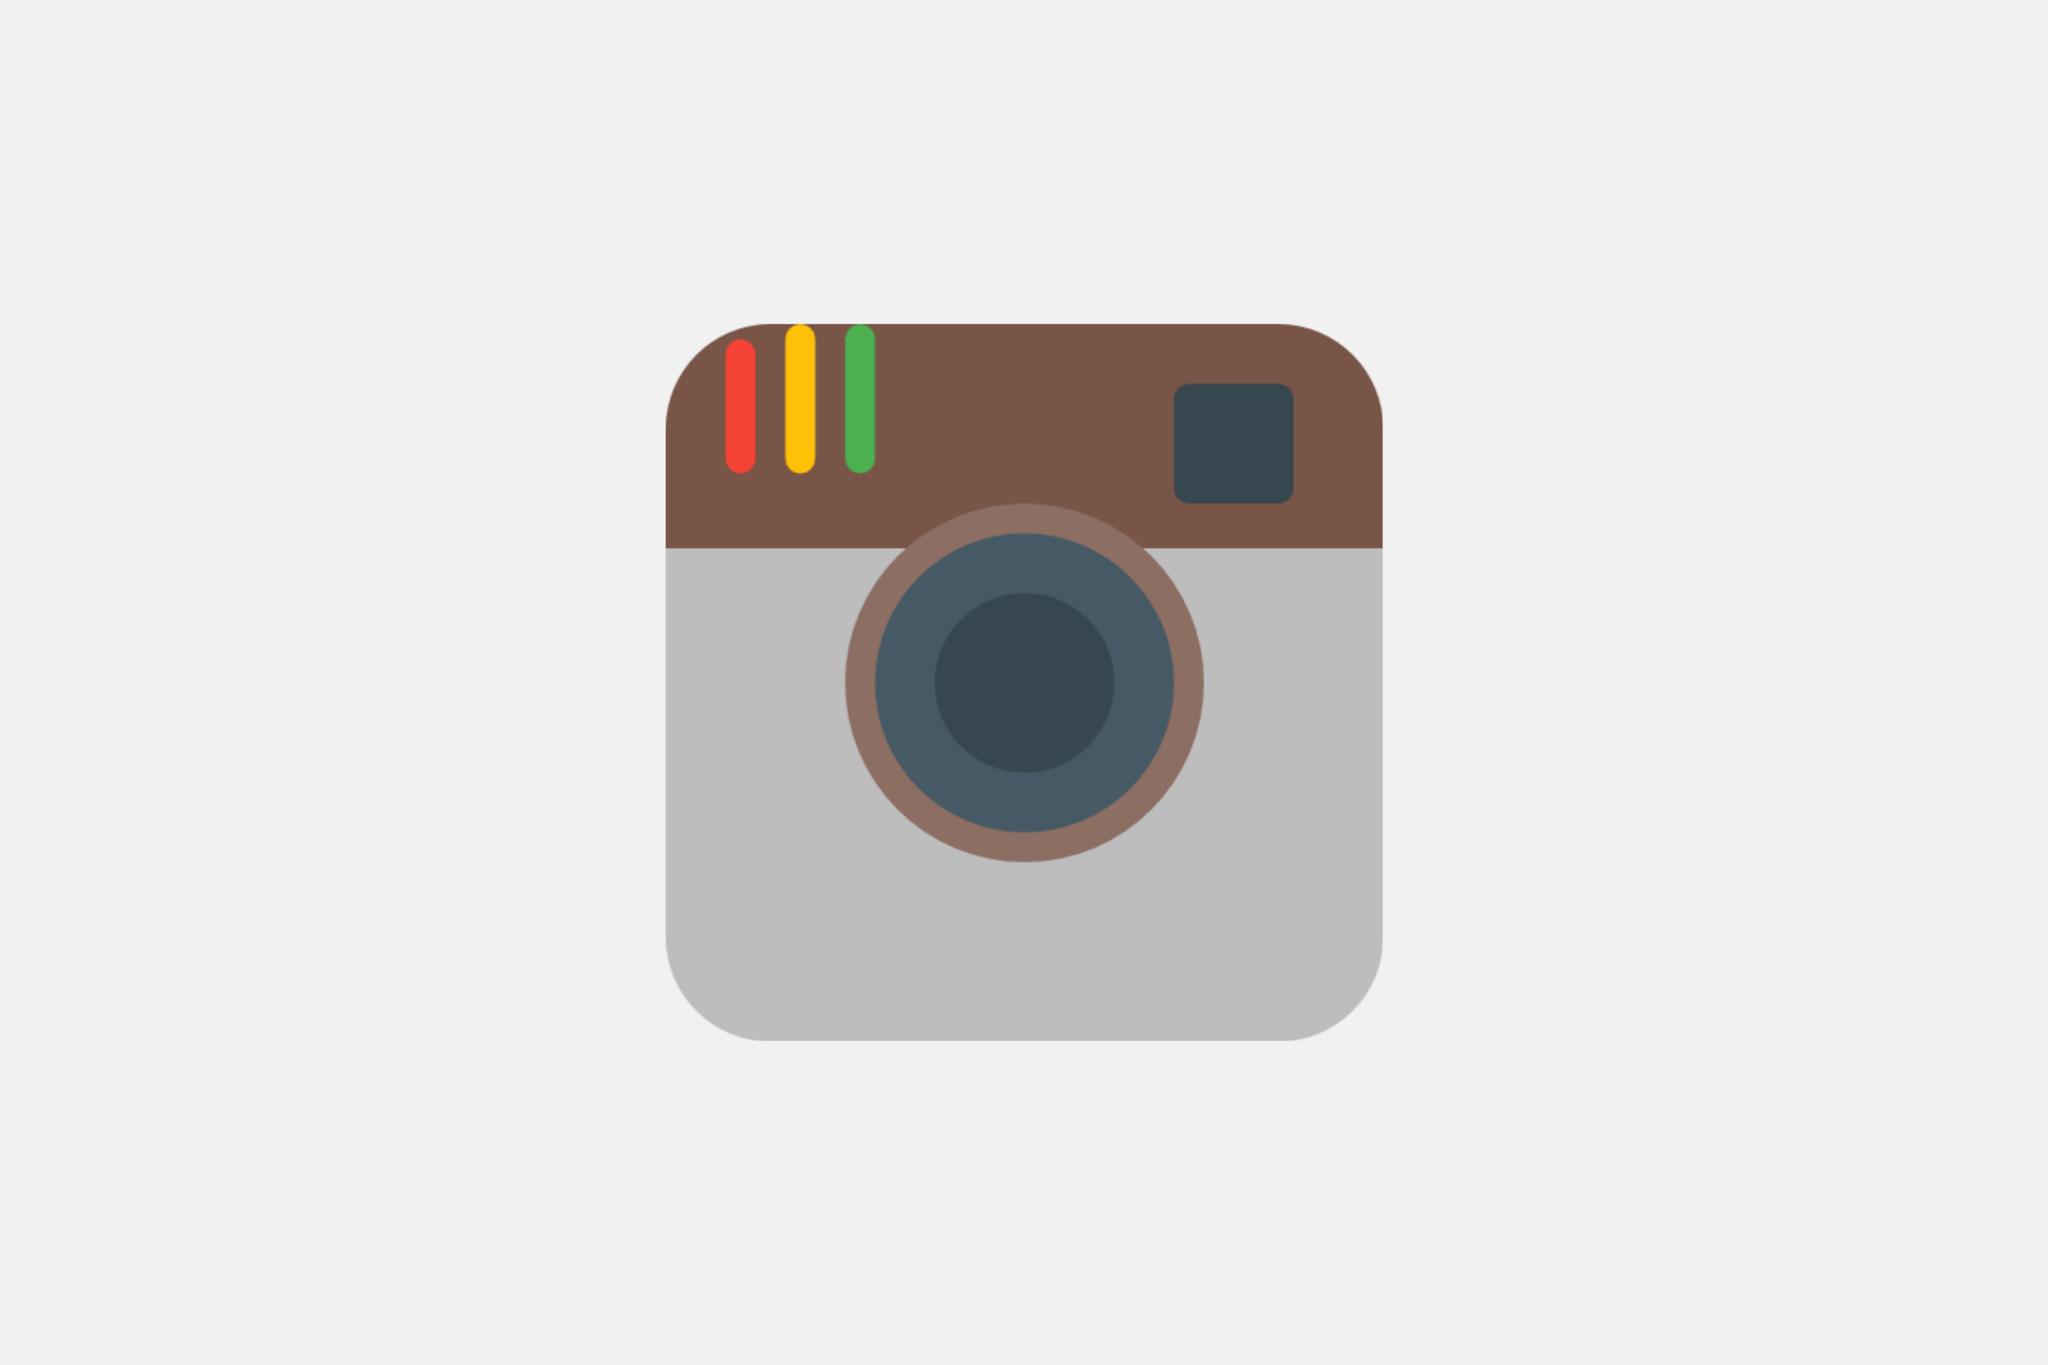 Cara ubah icon Instagram ke versi klasik